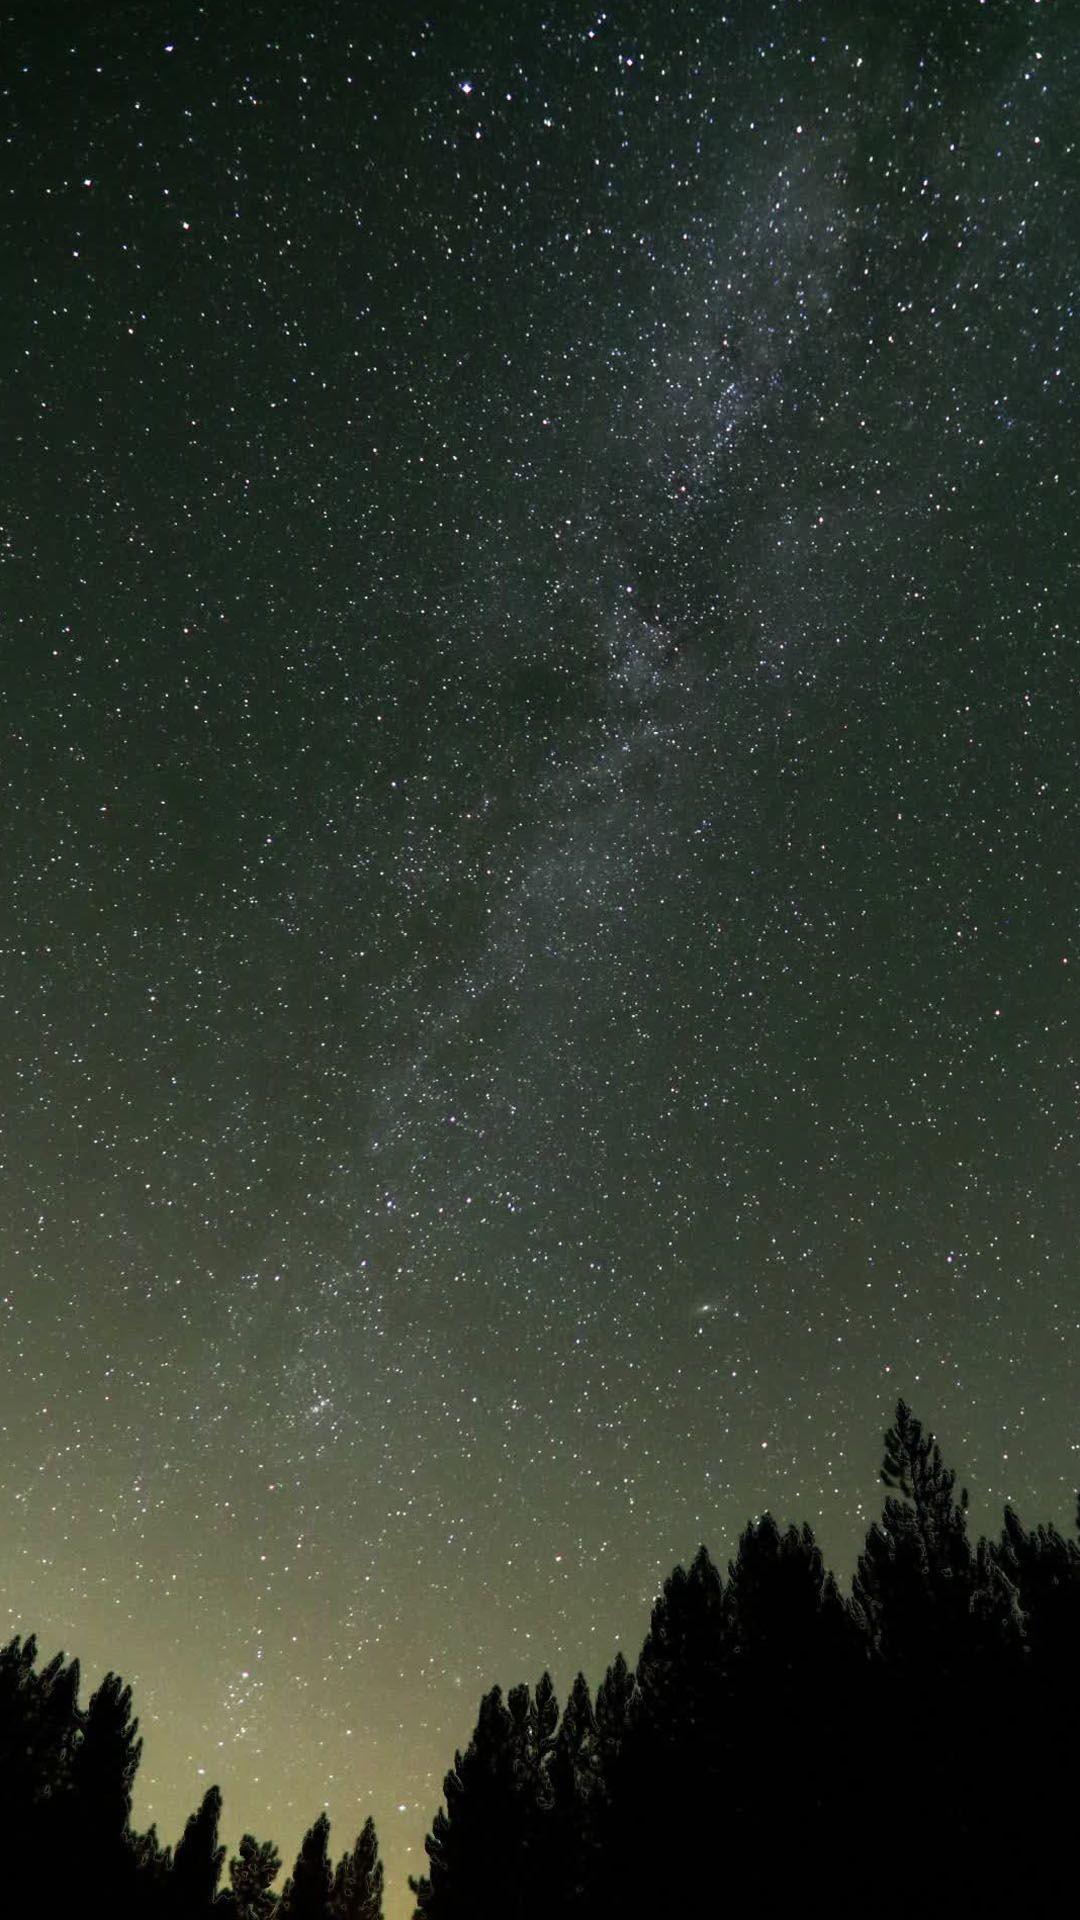 Nature starry night sky HD Samsung S4 wallpaper